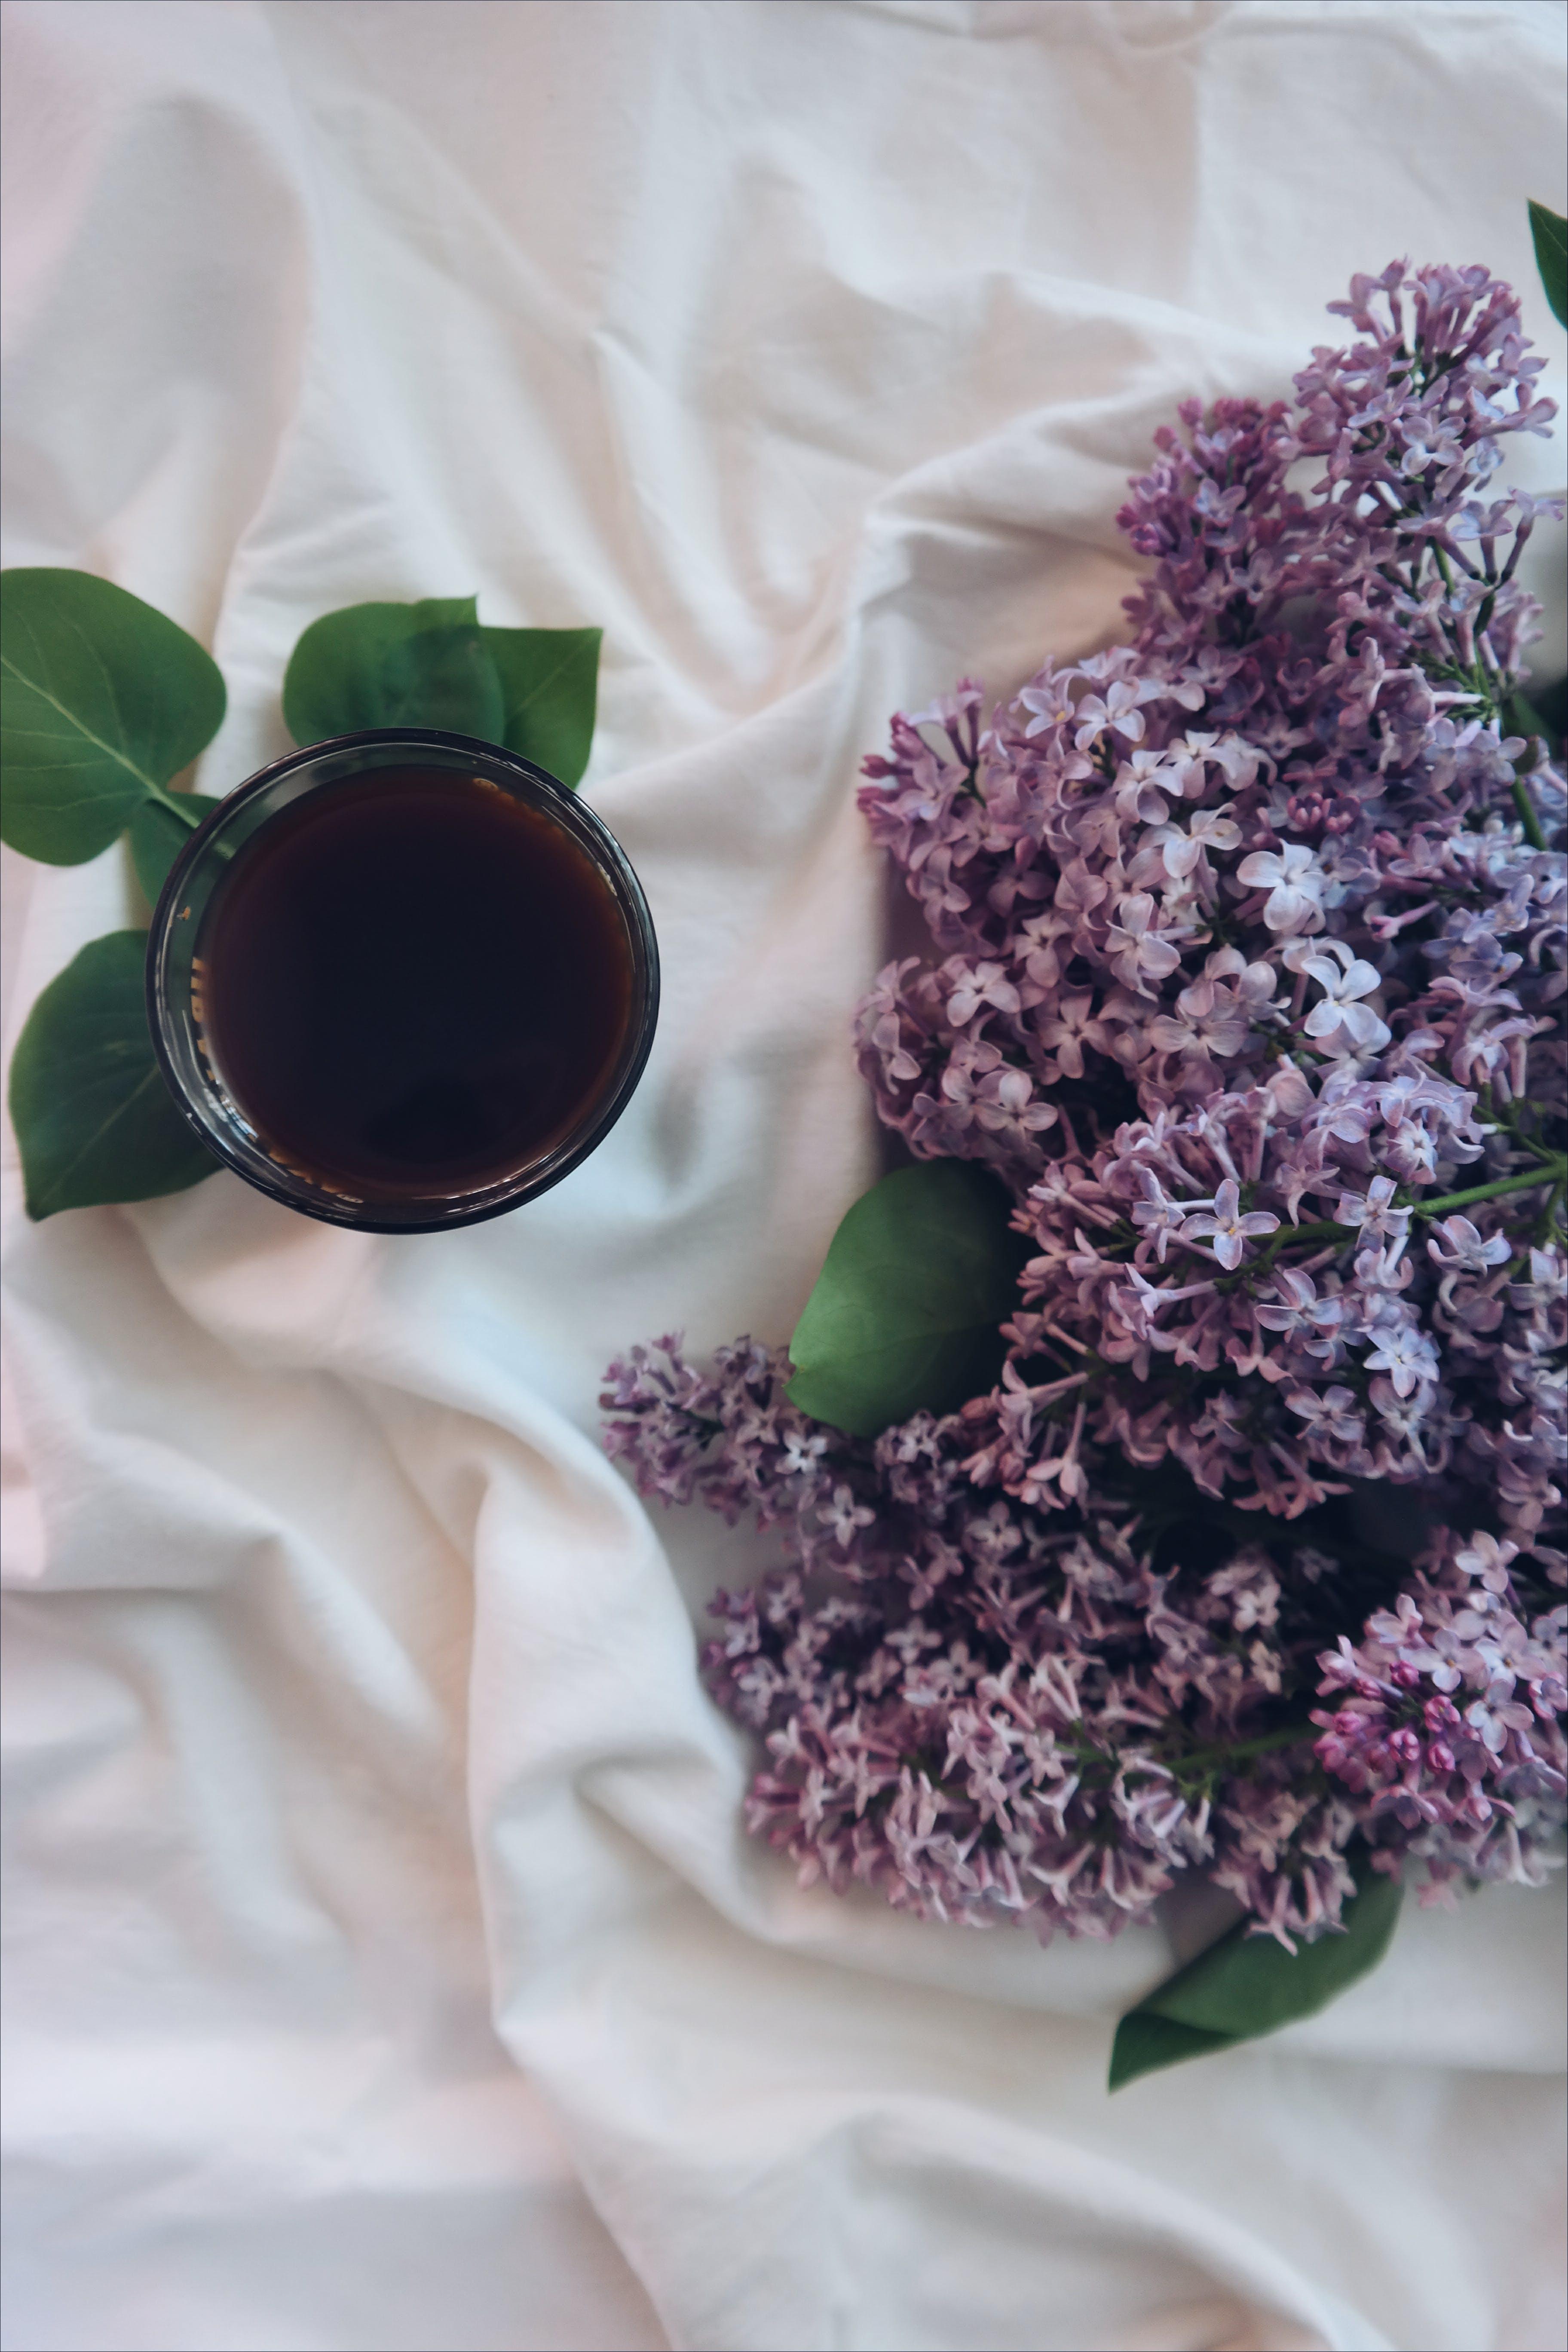 blanket, bouquet, close-up